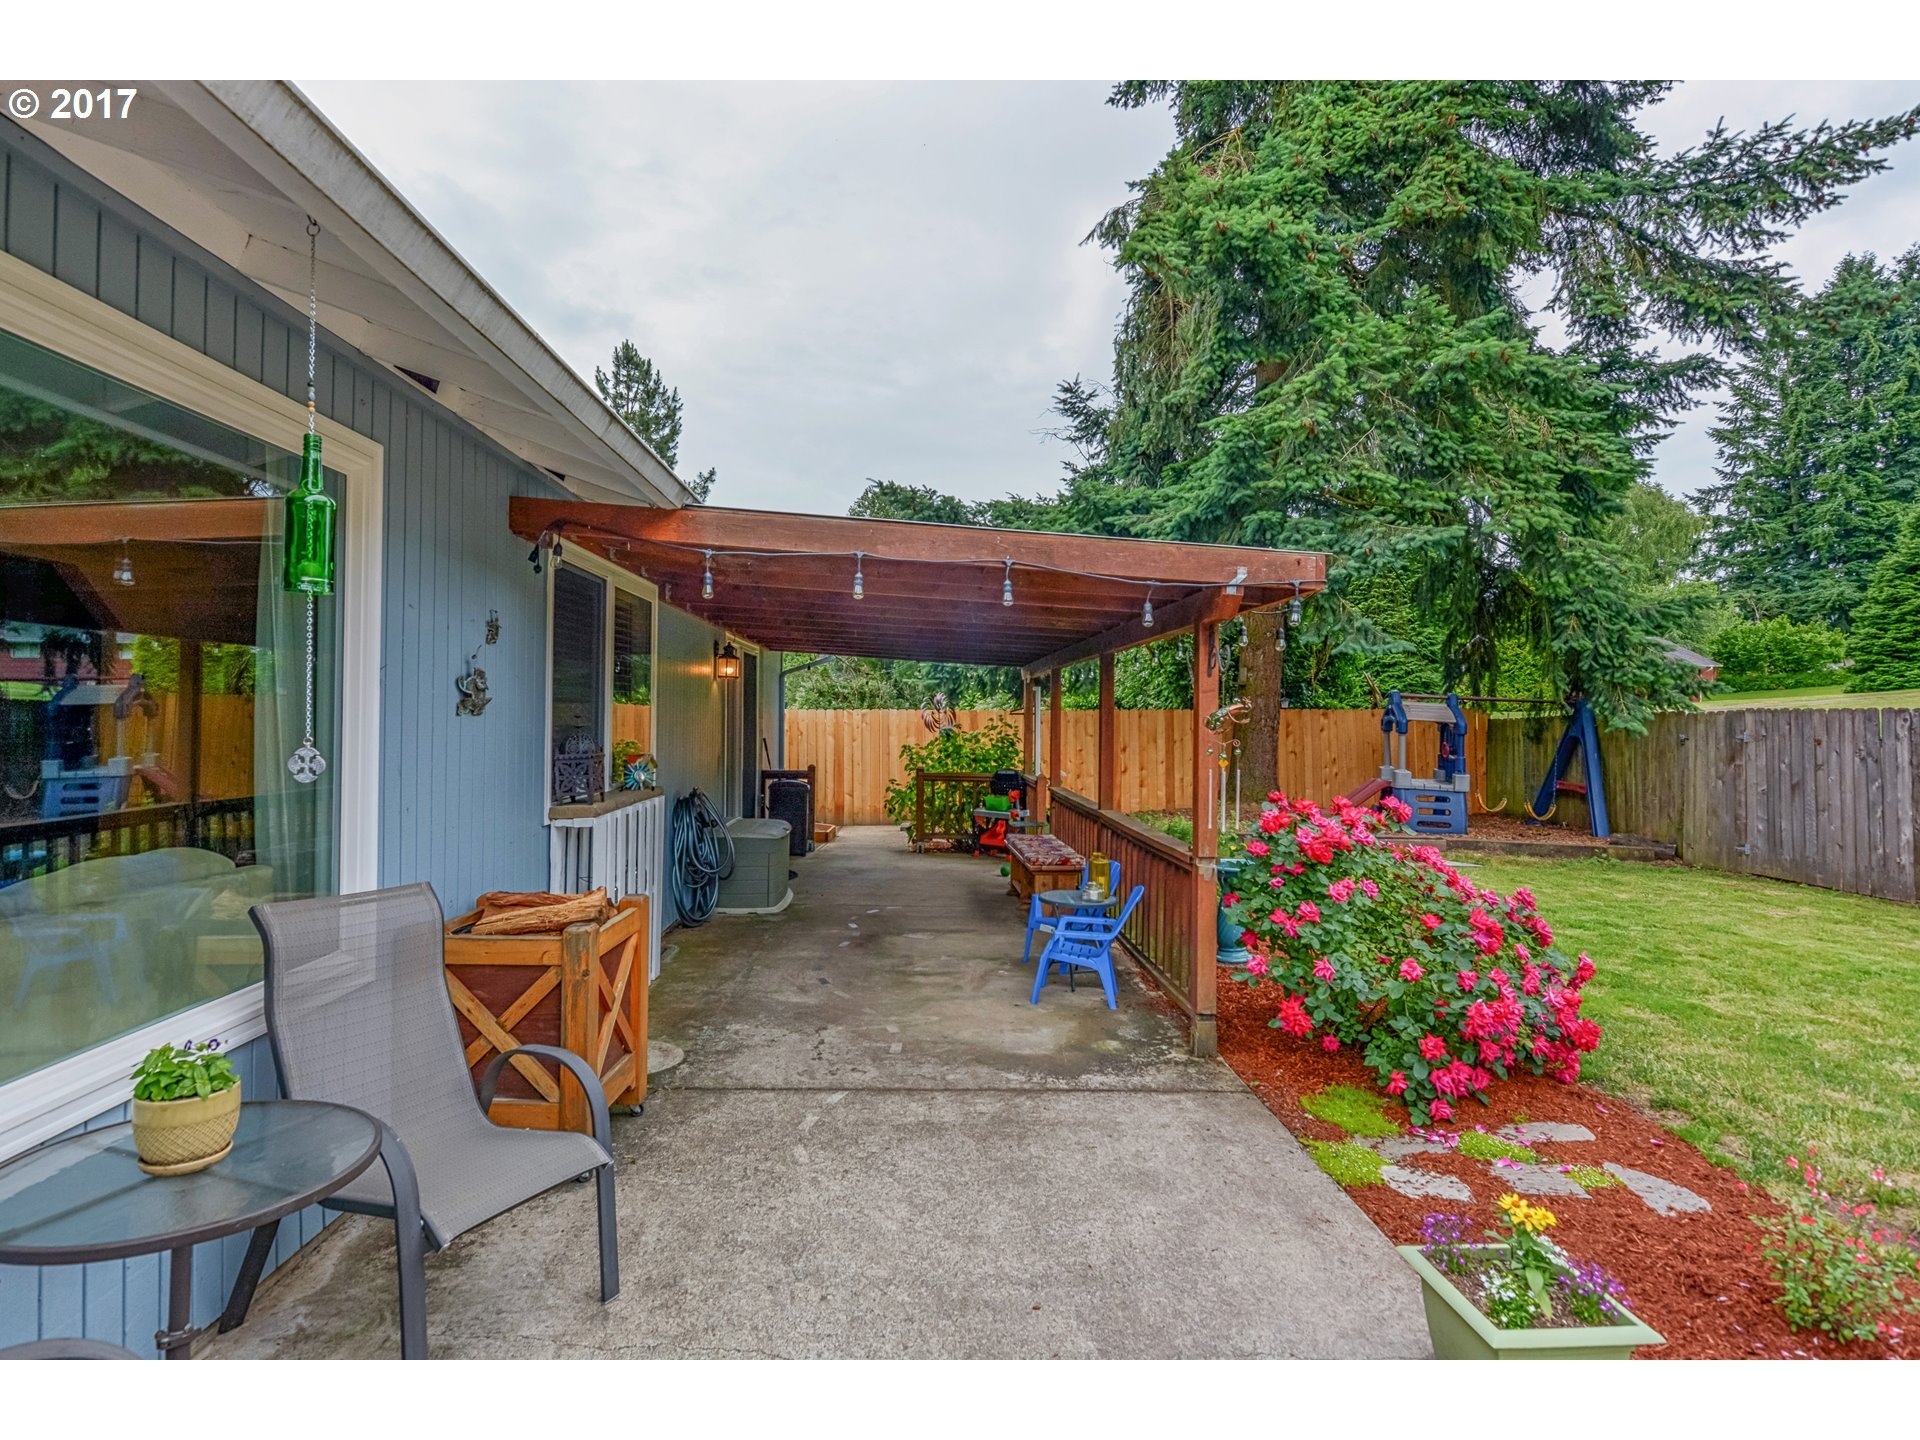 5528 NE 23RD AVE Vancouver, WA 98663 - MLS #: 17669447